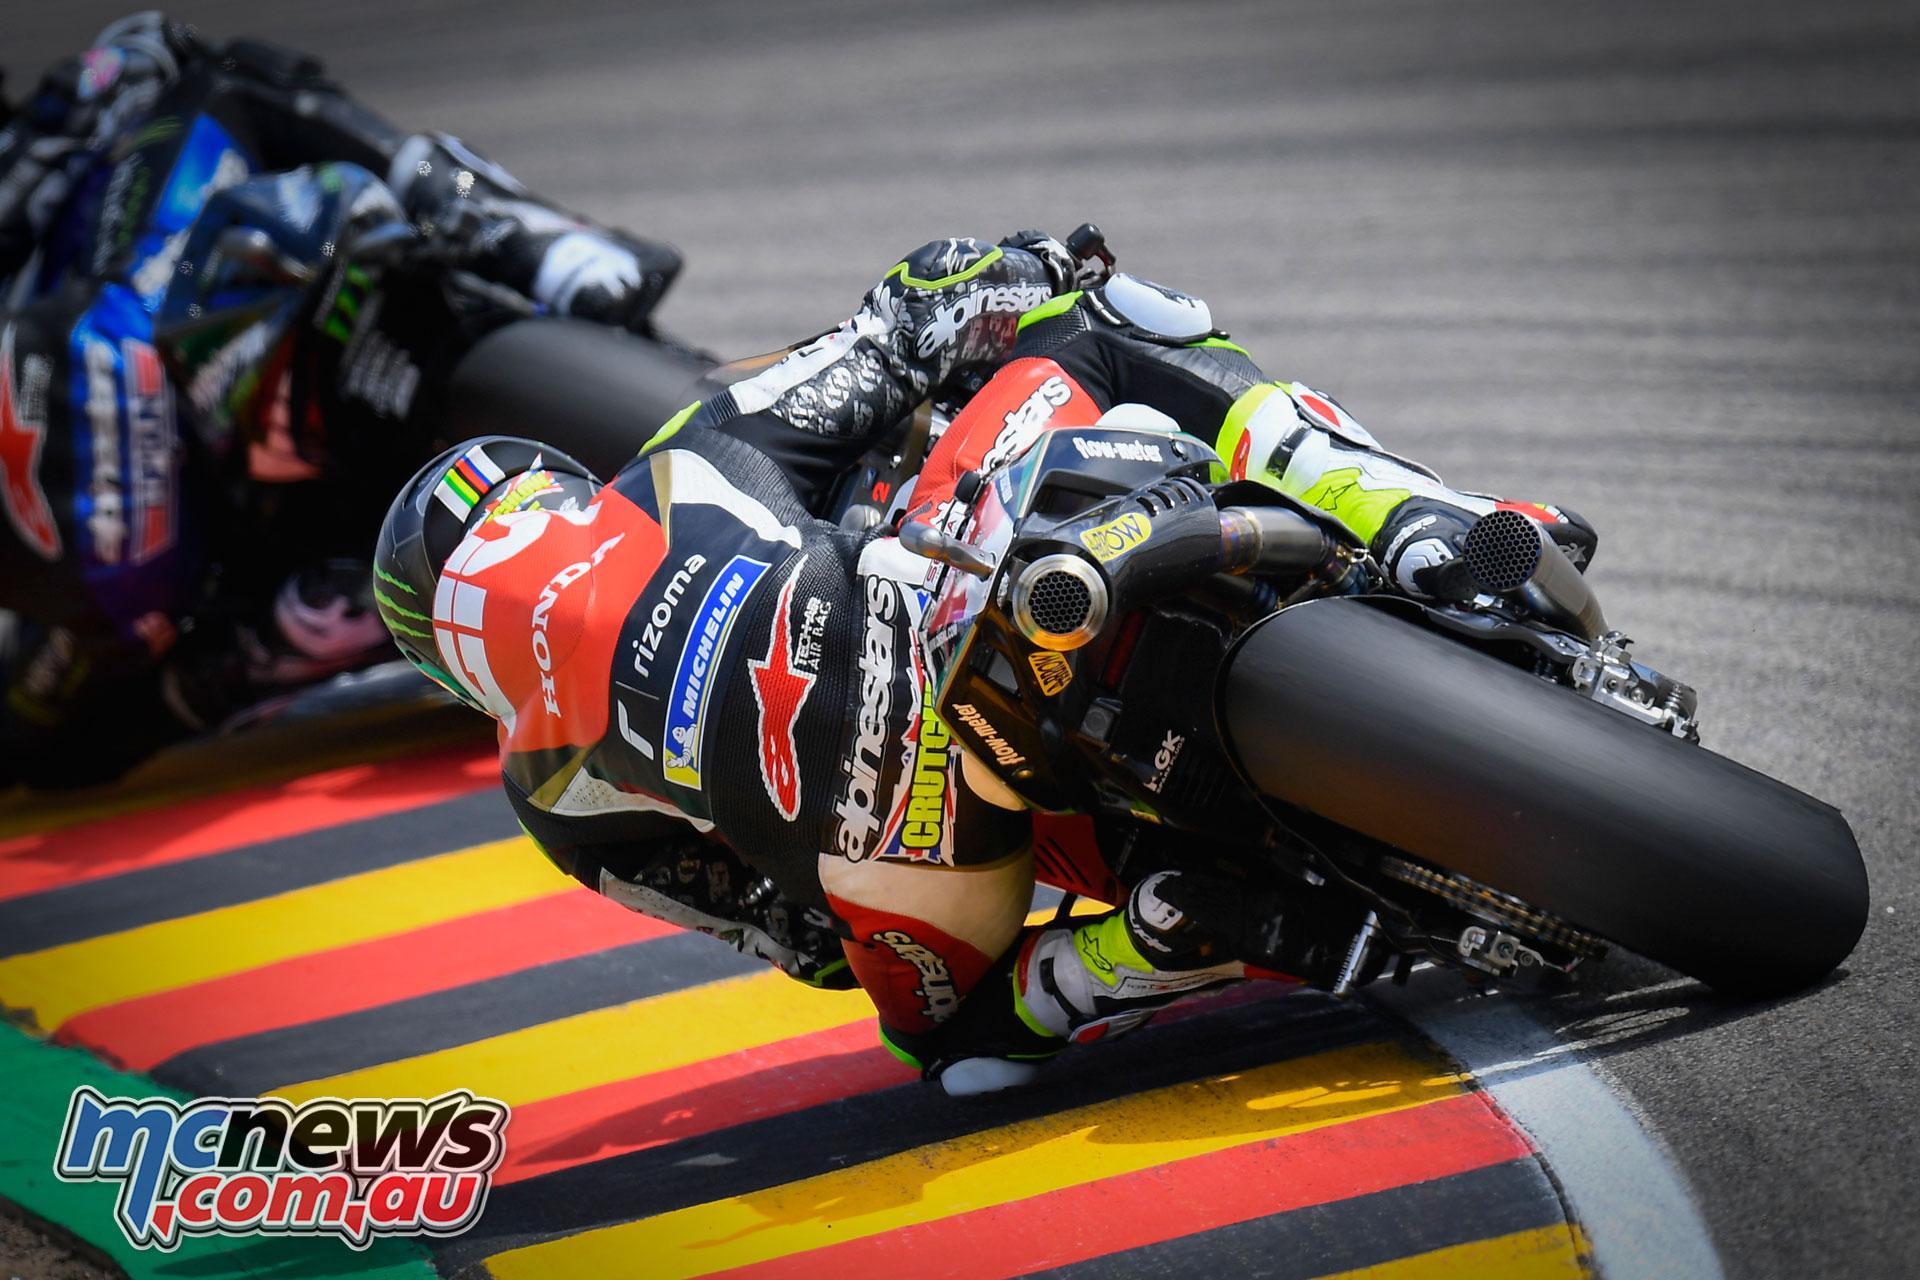 MotoGP Rnd Sachsenring Germany Cal Crutchlow